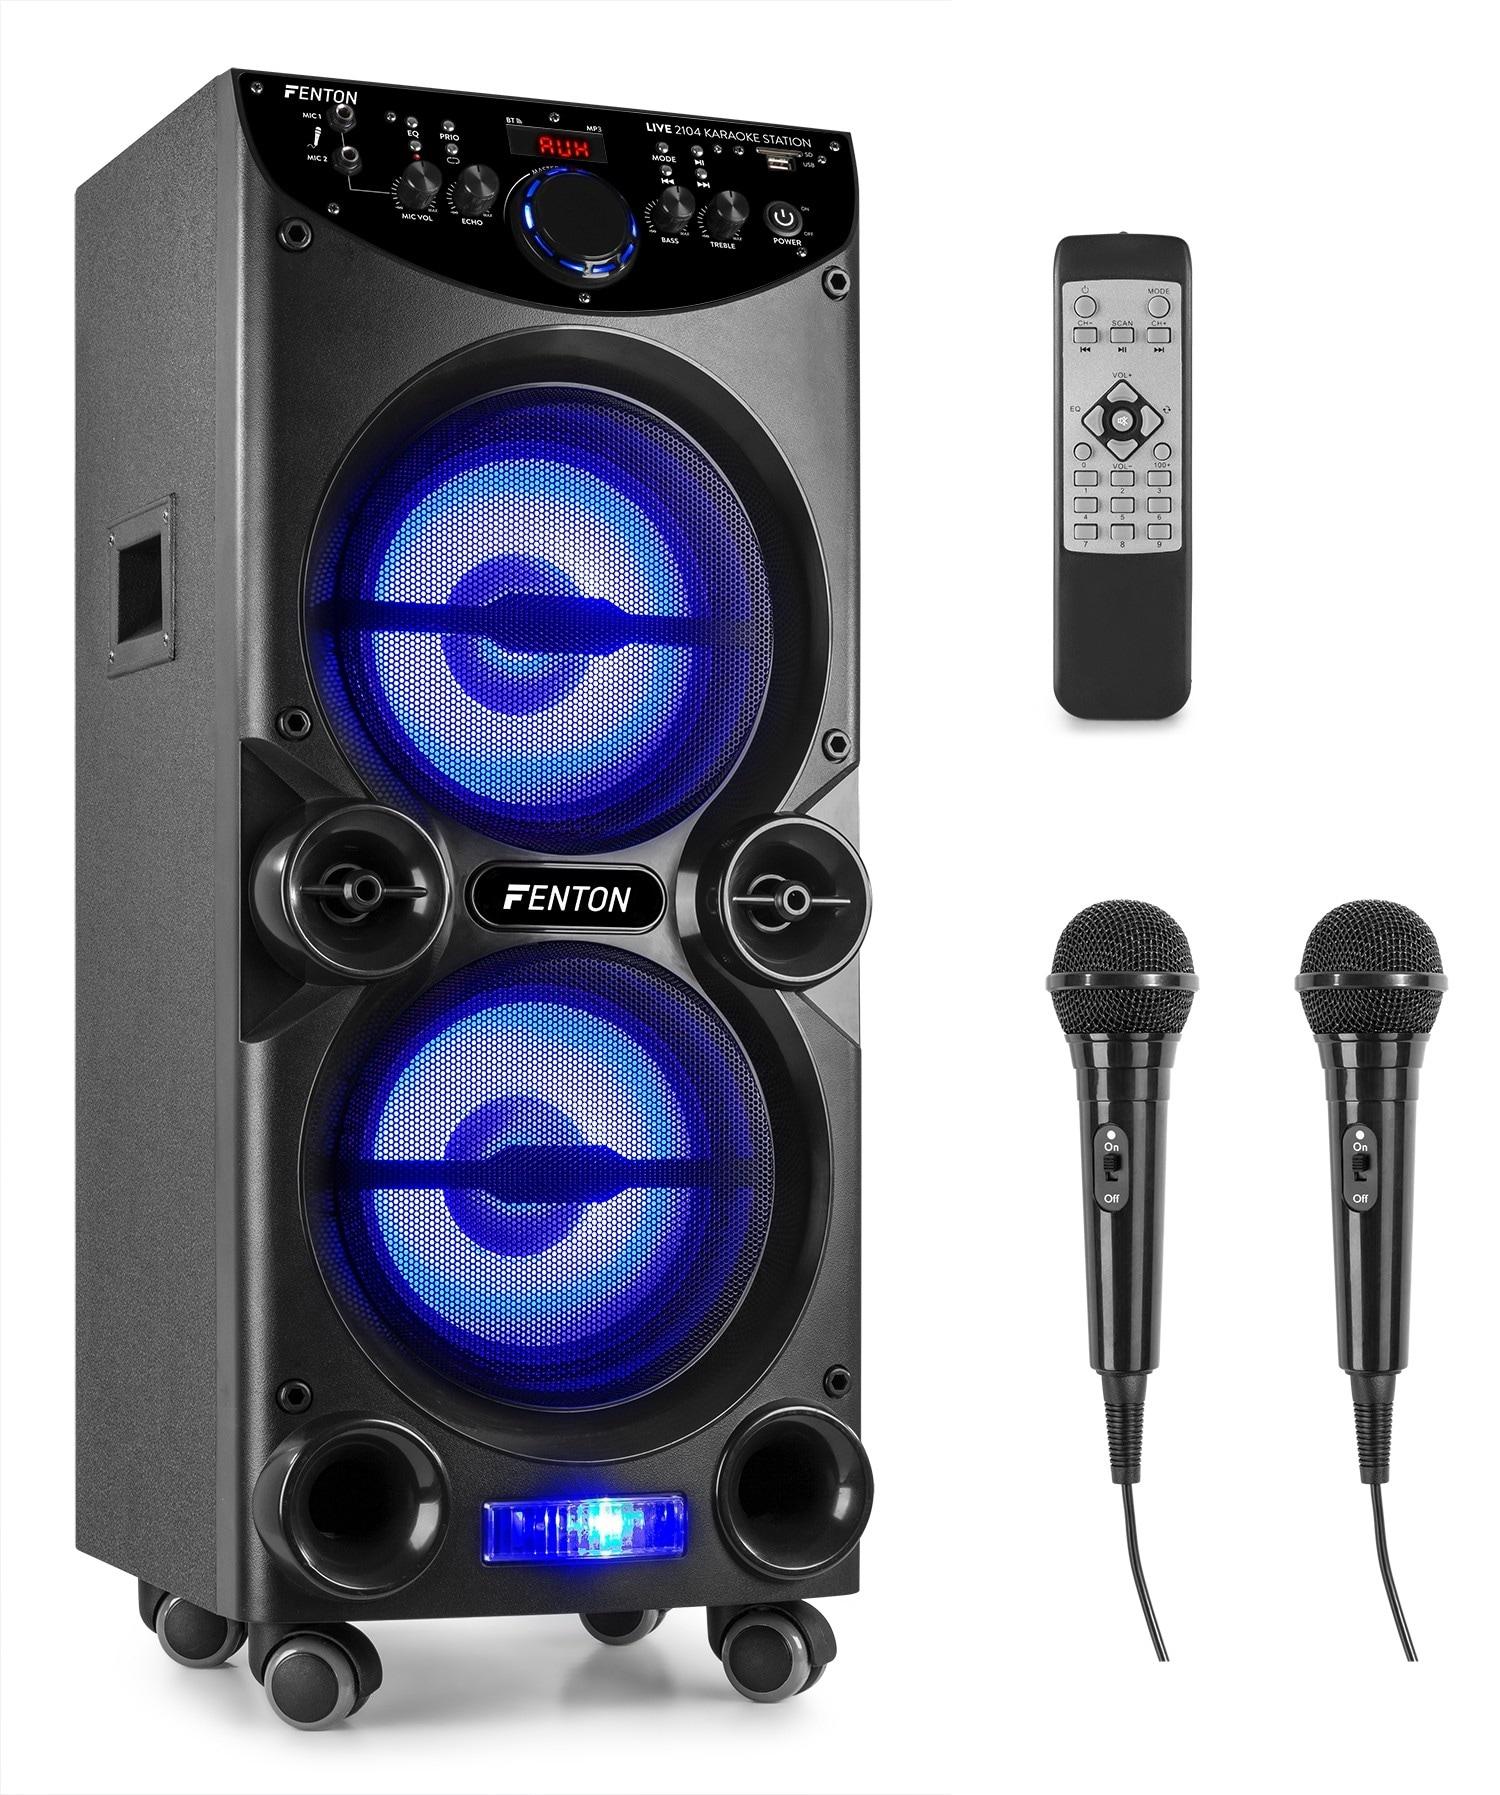 "Fenton LIVE2104 karaoke Party station, 2x10"", USB, Mikrofon"